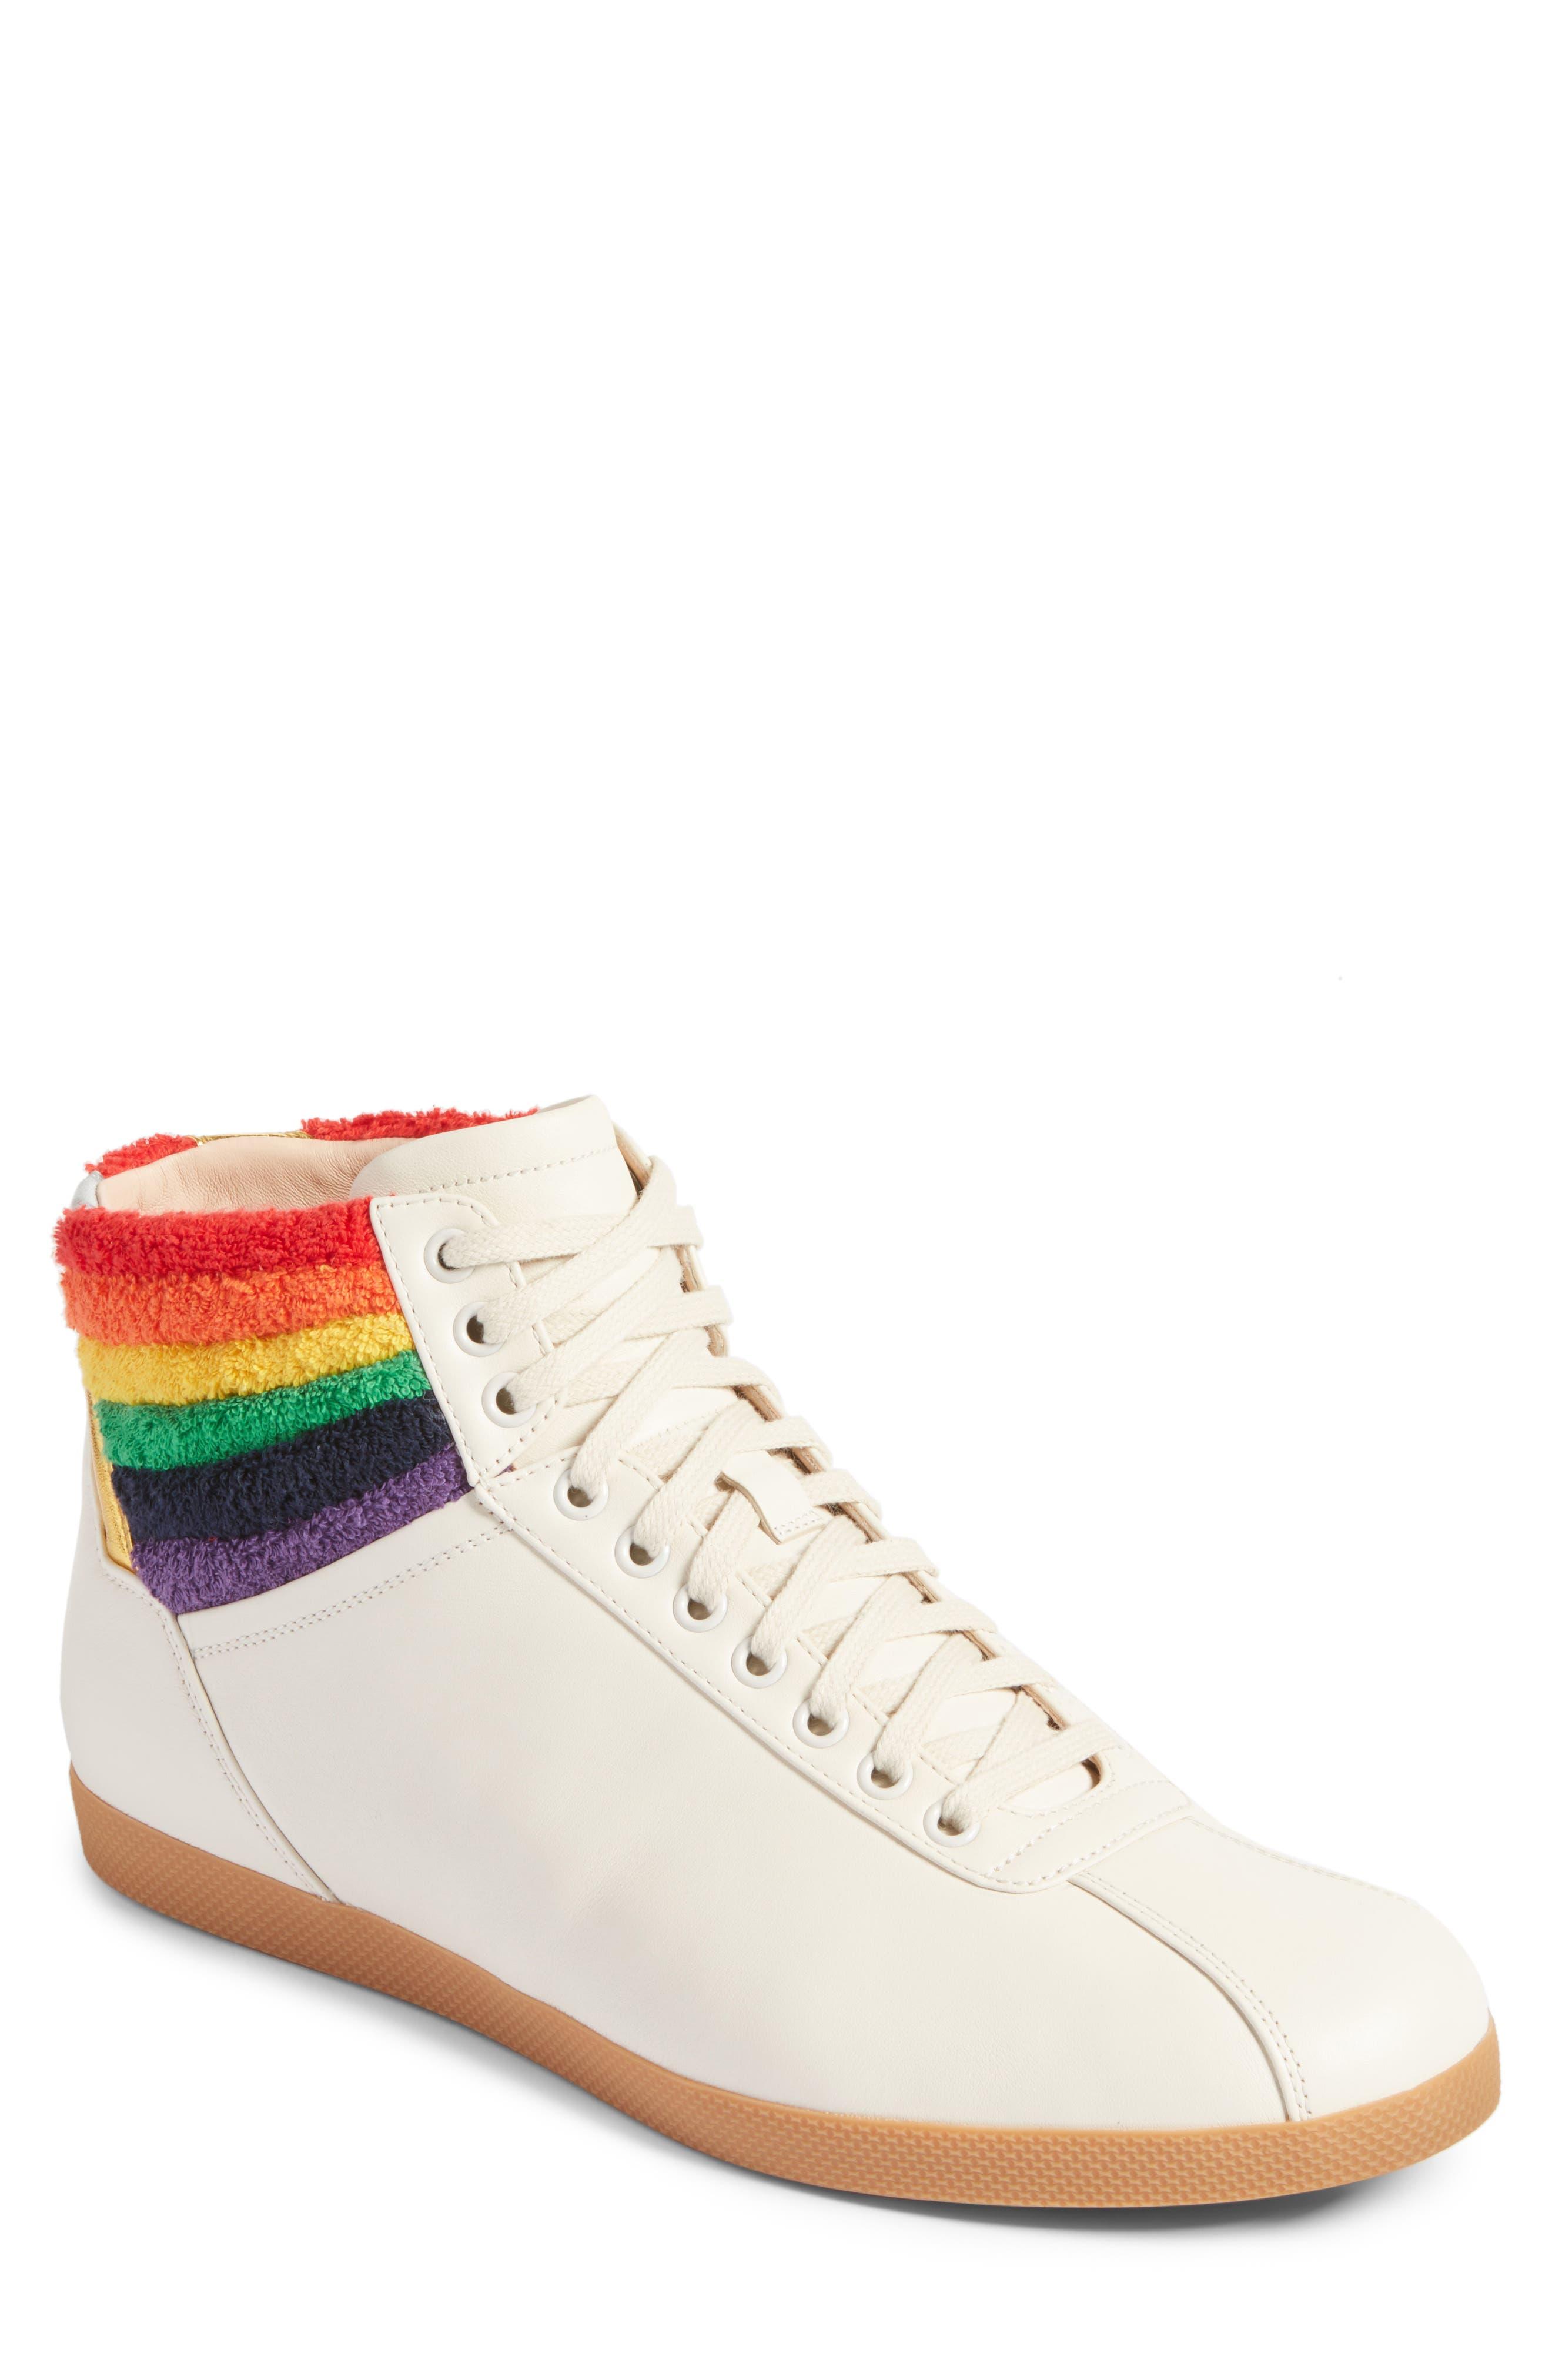 GUCCI Bambi Rainbow Terry High Top Sneaker